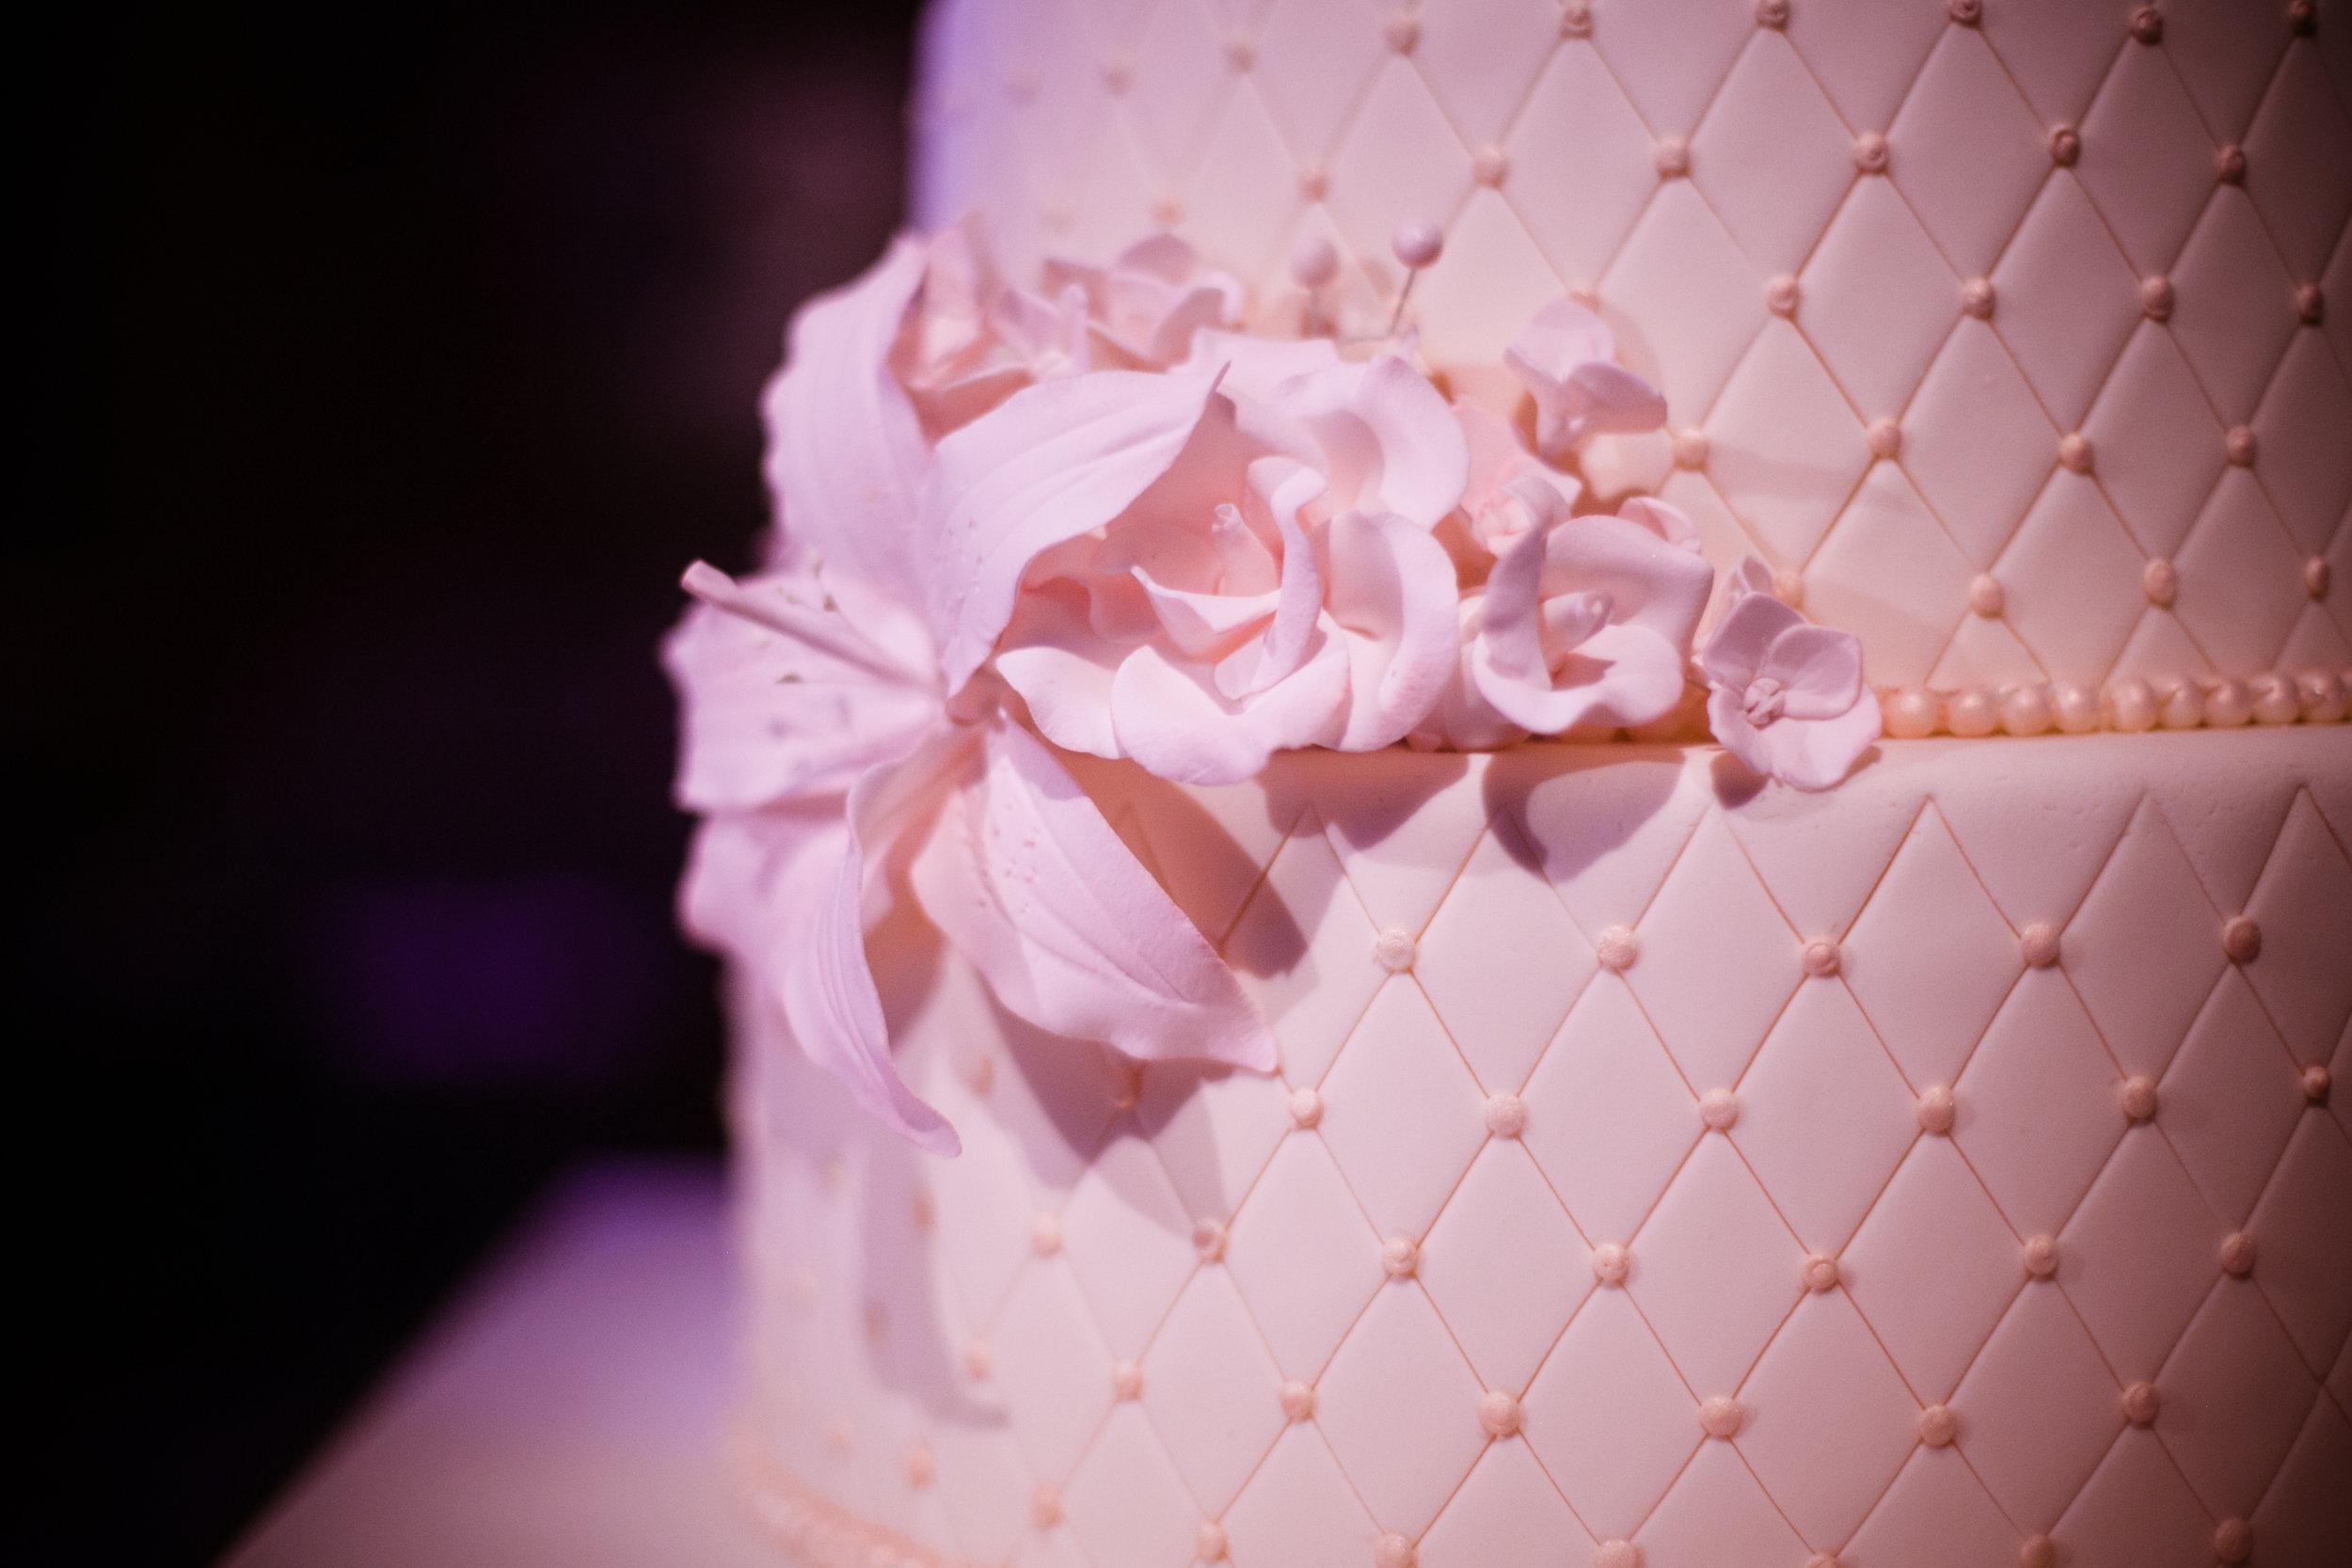 23 wedding cake closeup detailed wedding cake simple wedding cake all white wedding cake flowers on wedding cake Christine Johnson Photography Life Design Events.jpg